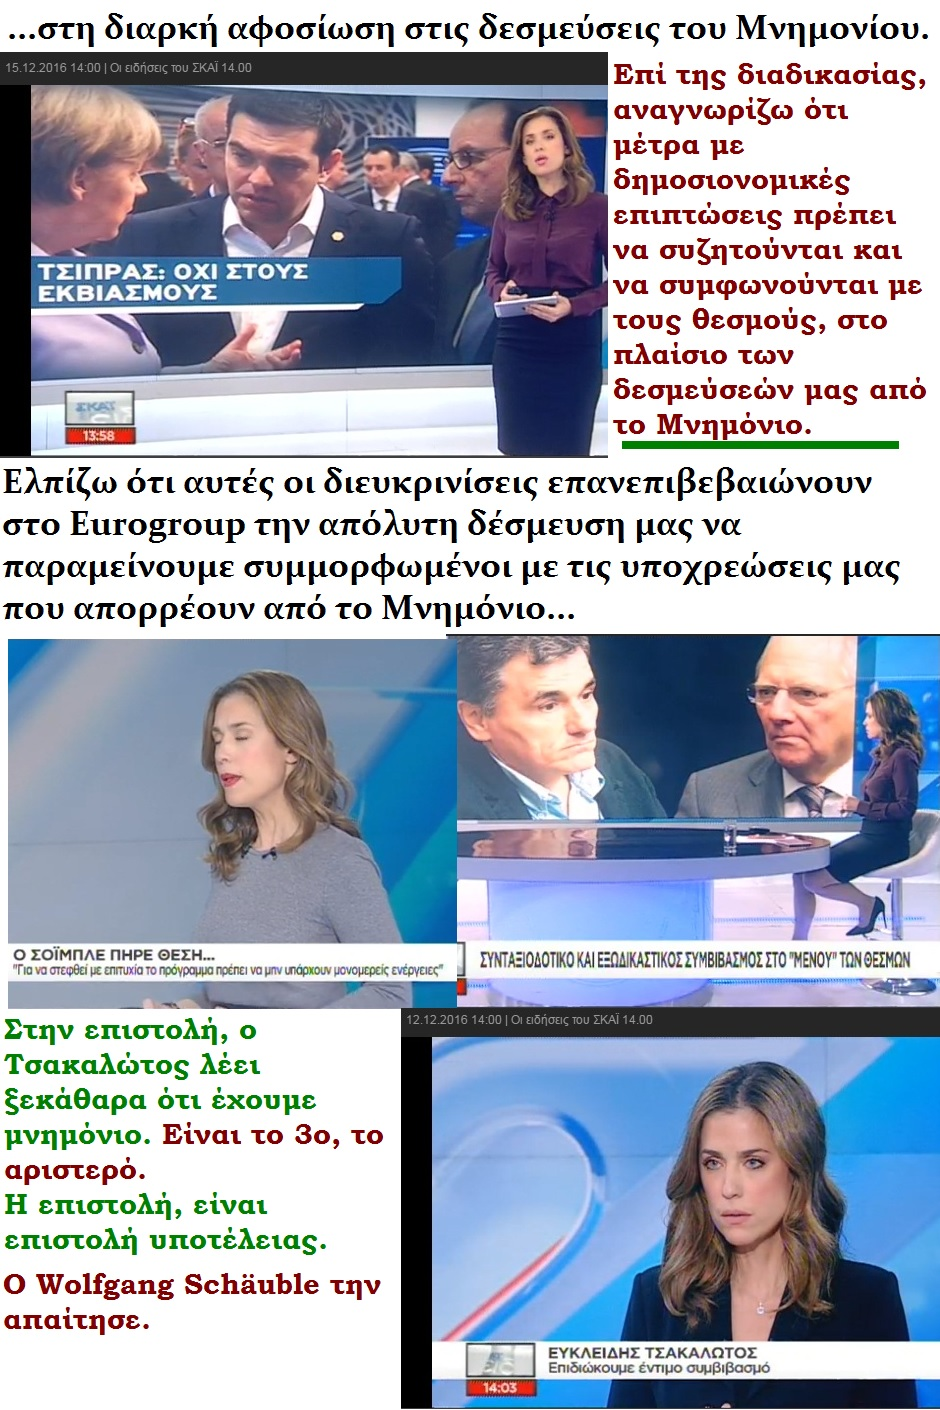 ellada-tsipras-tsakalotos-soible-latter-01-291216